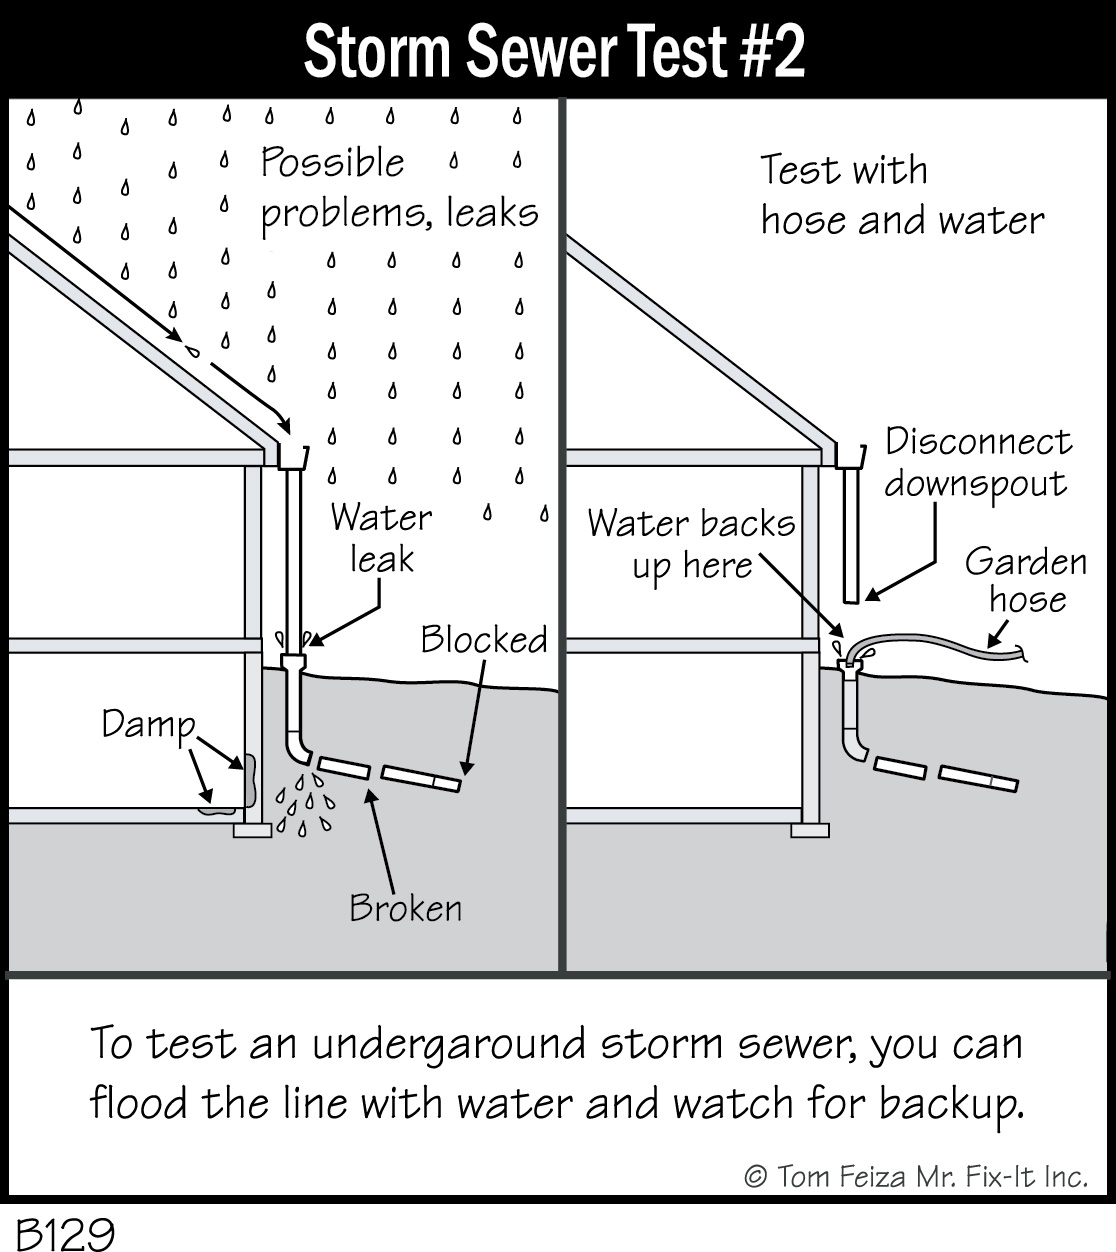 B129 Storm Sewer Test 2